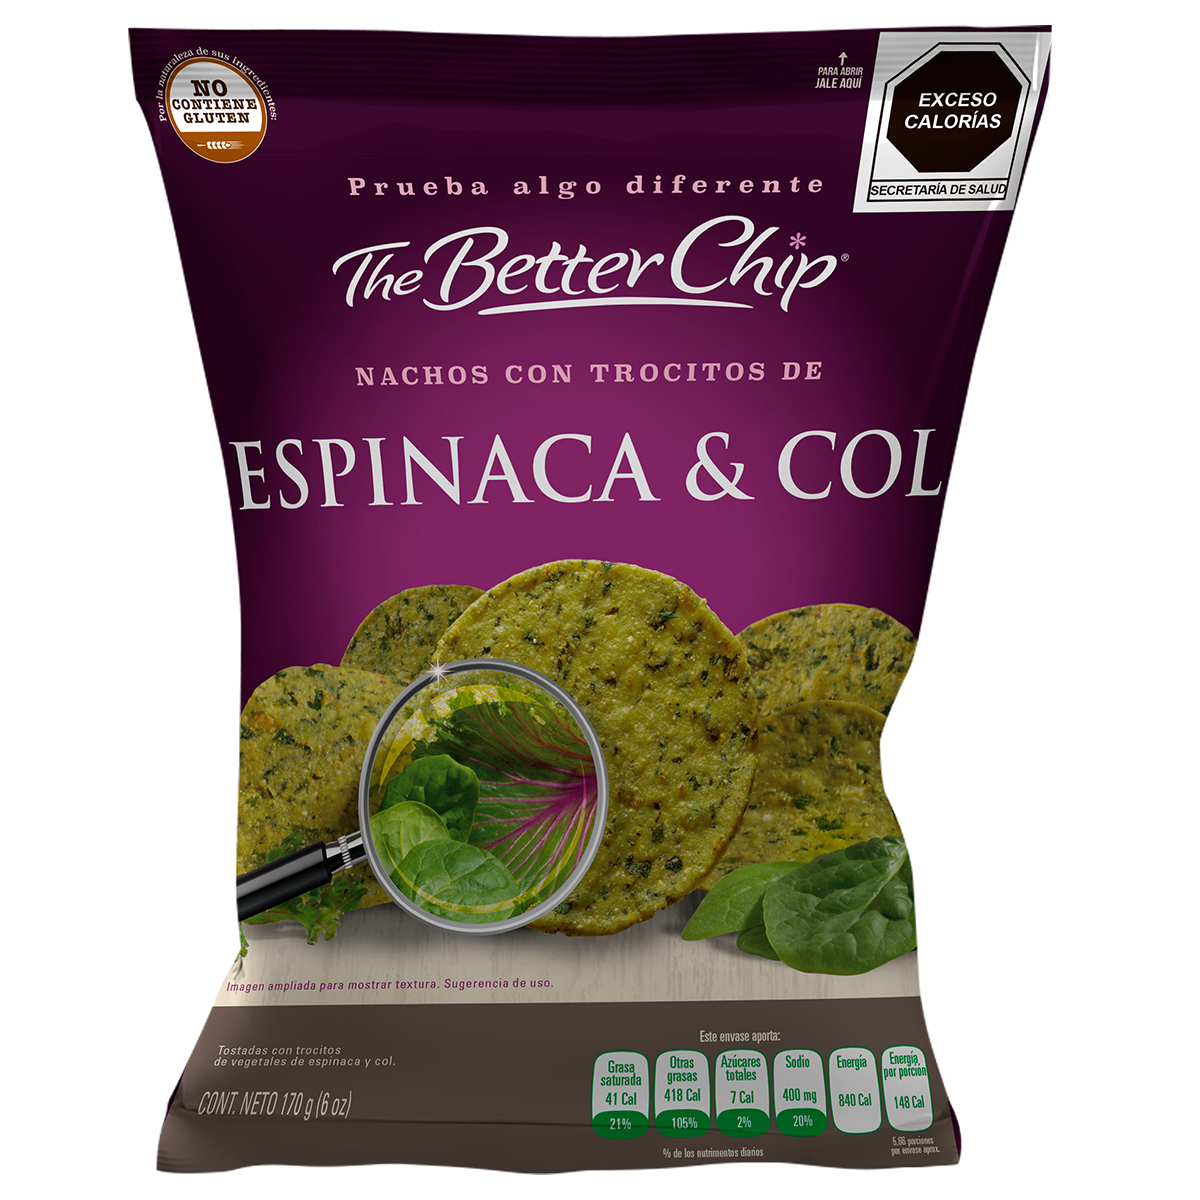 The Better Chip - Espinaca & Col - Hechos con Vegetales